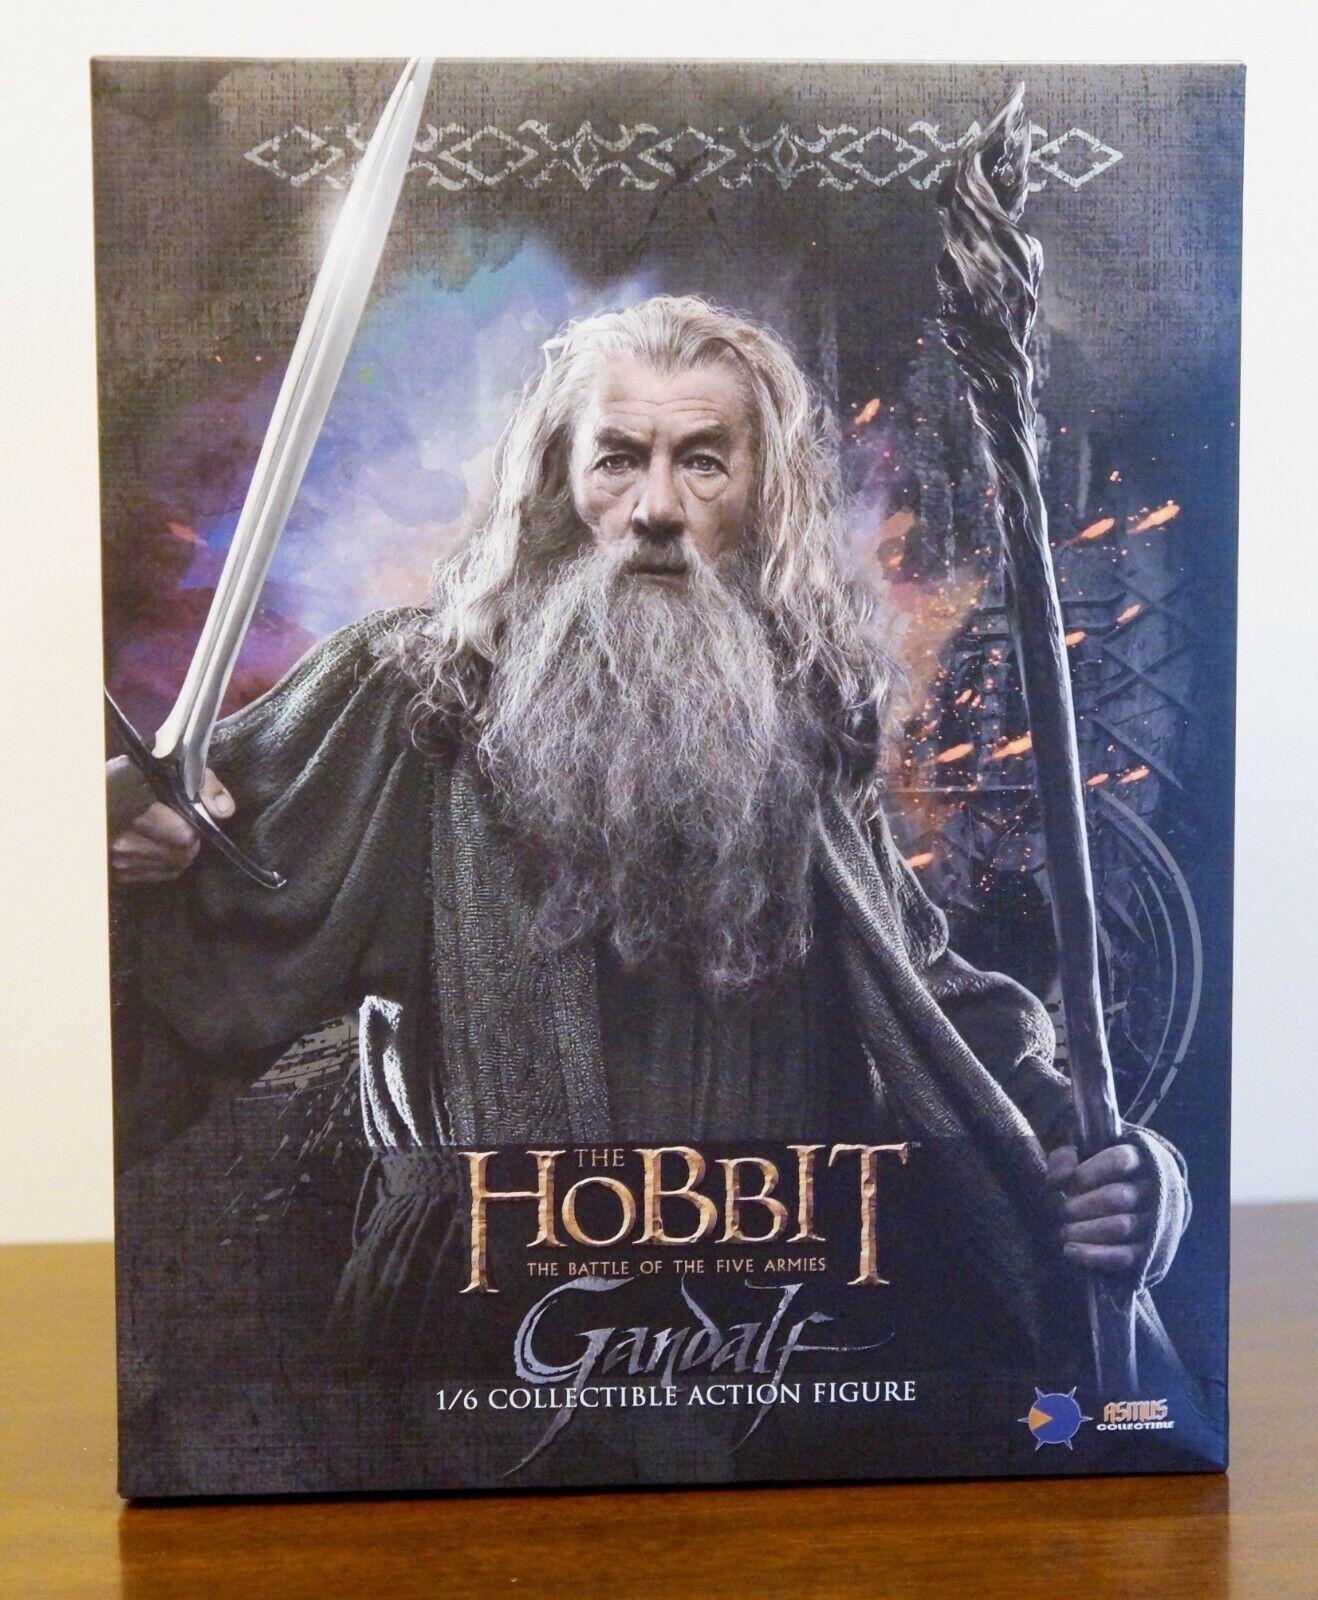 ASMUS giocattoli Deluxe Hobbit Gealf the grigio 1 6  Lord of the Rings - NIB  prendi l'ultimo